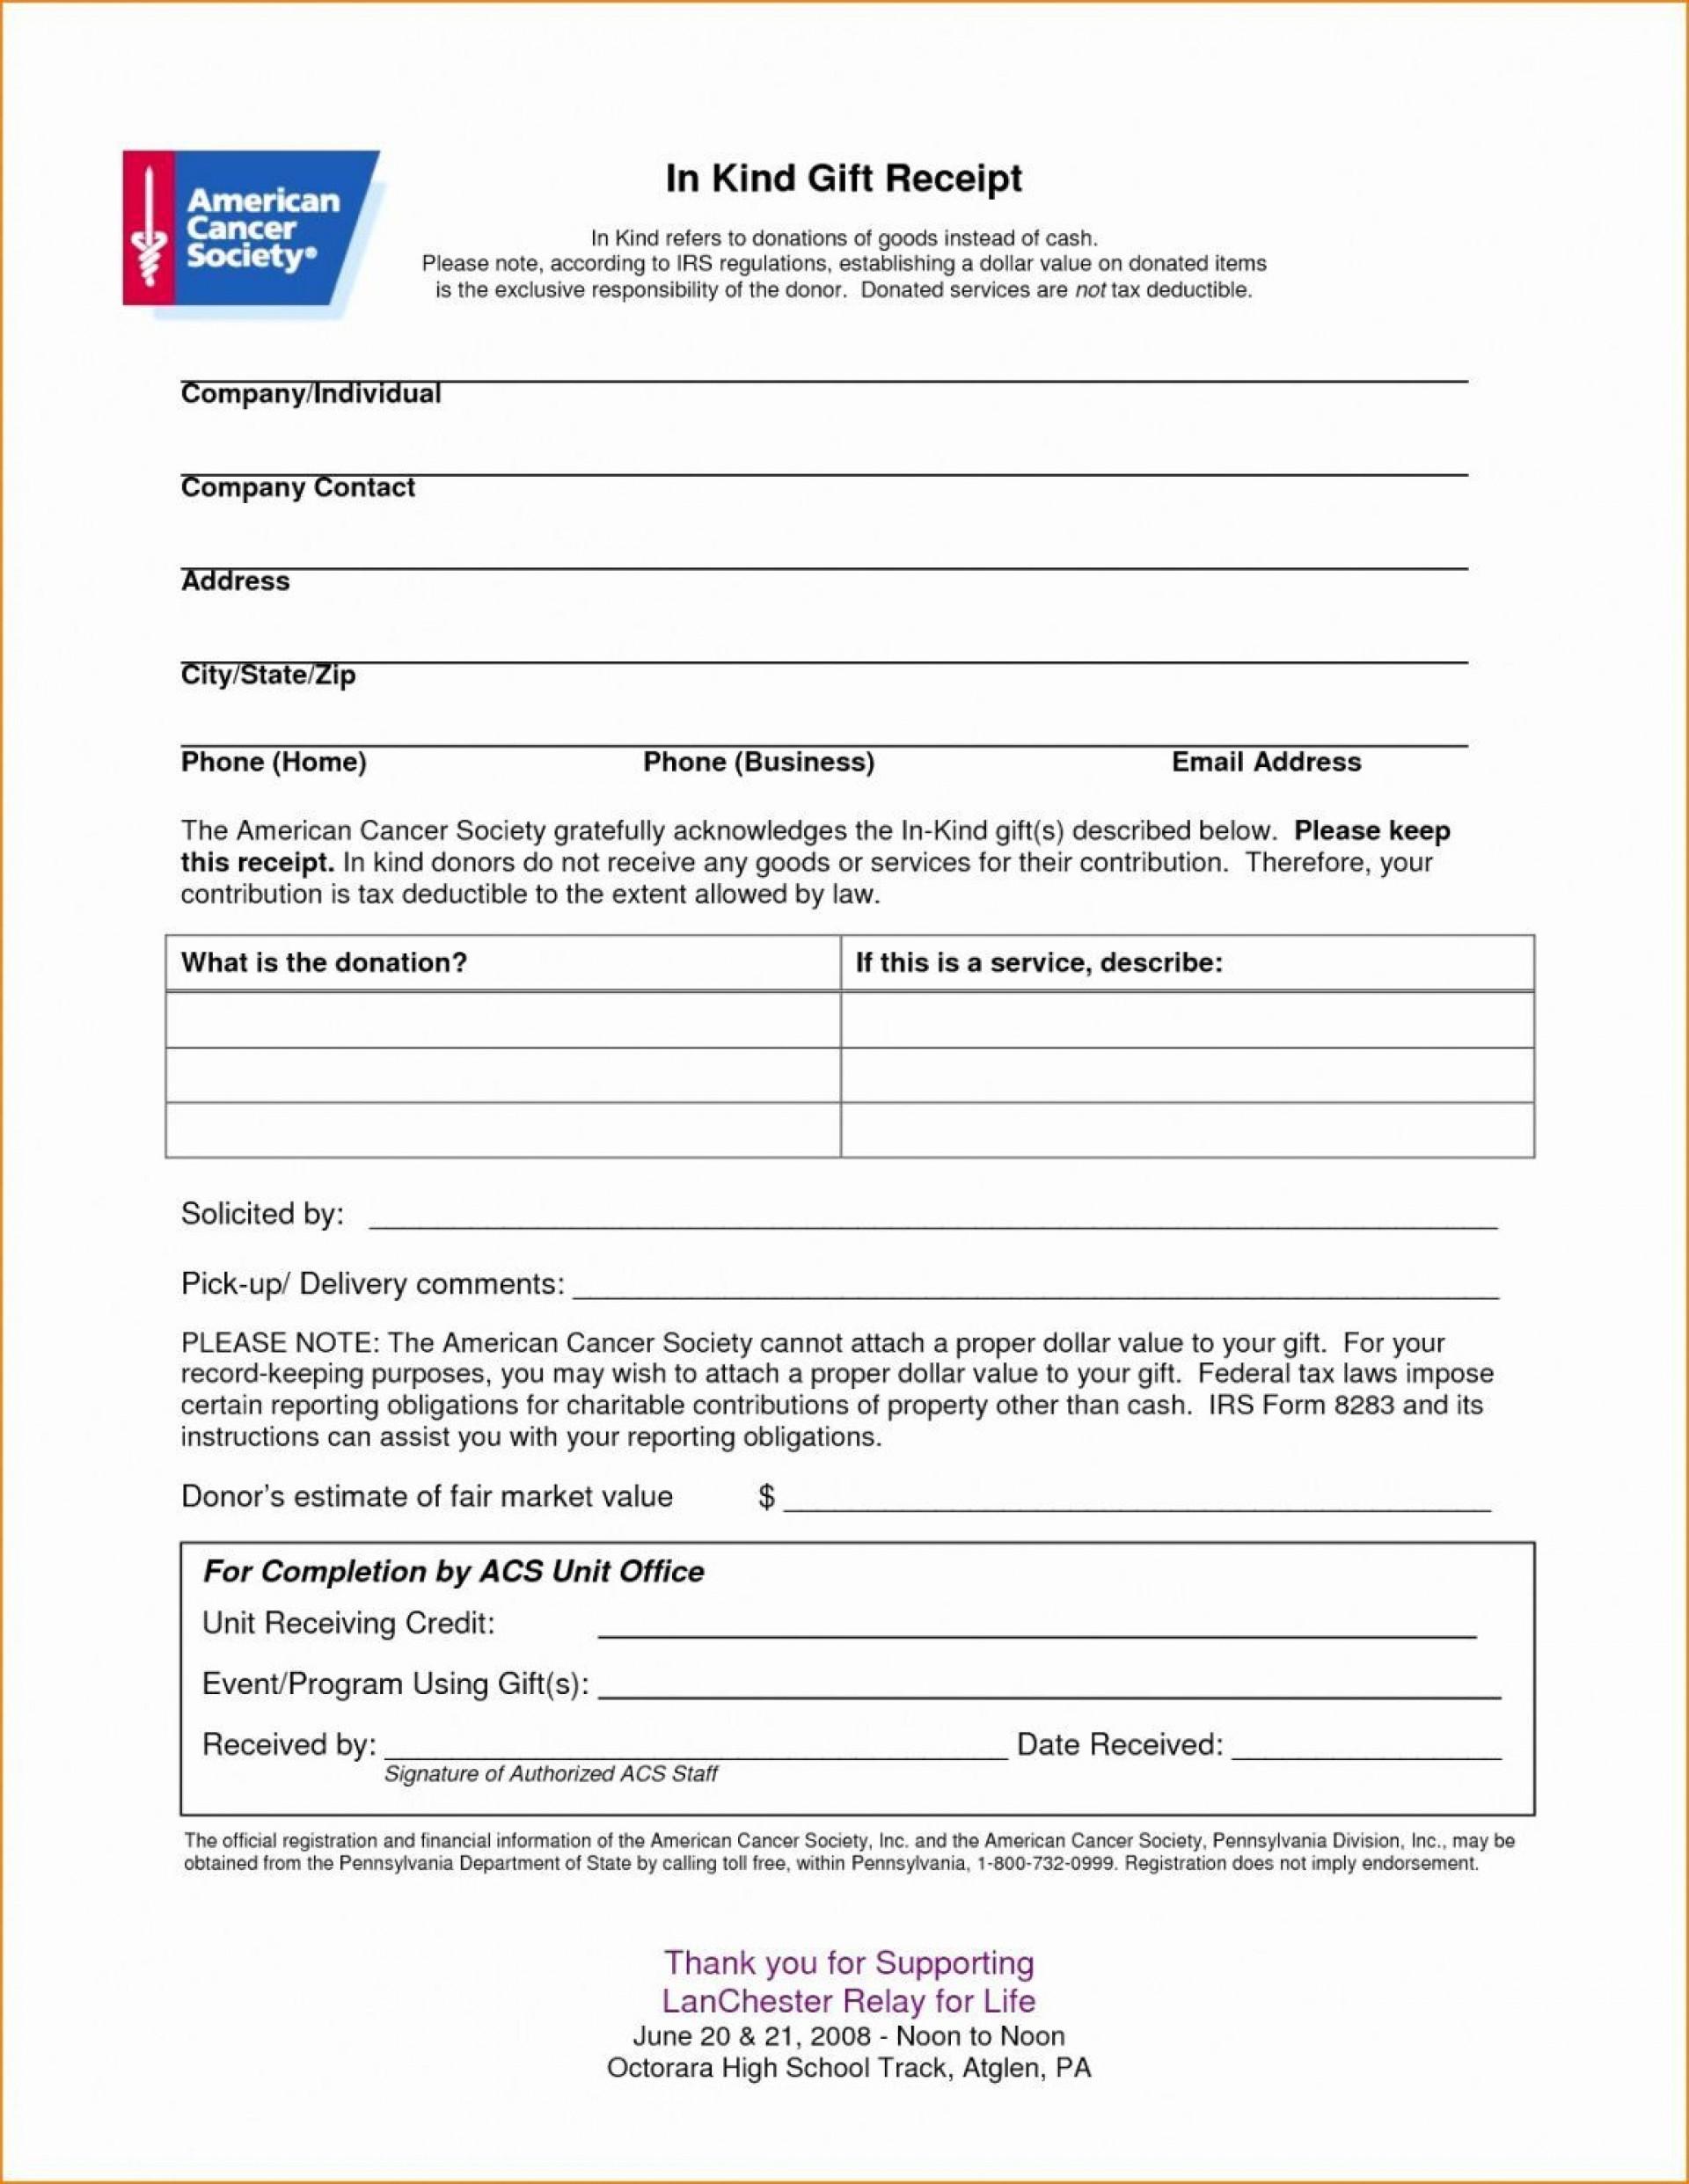 007 Stirring Tax Deductible Donation Receipt Template Australia Idea 1920